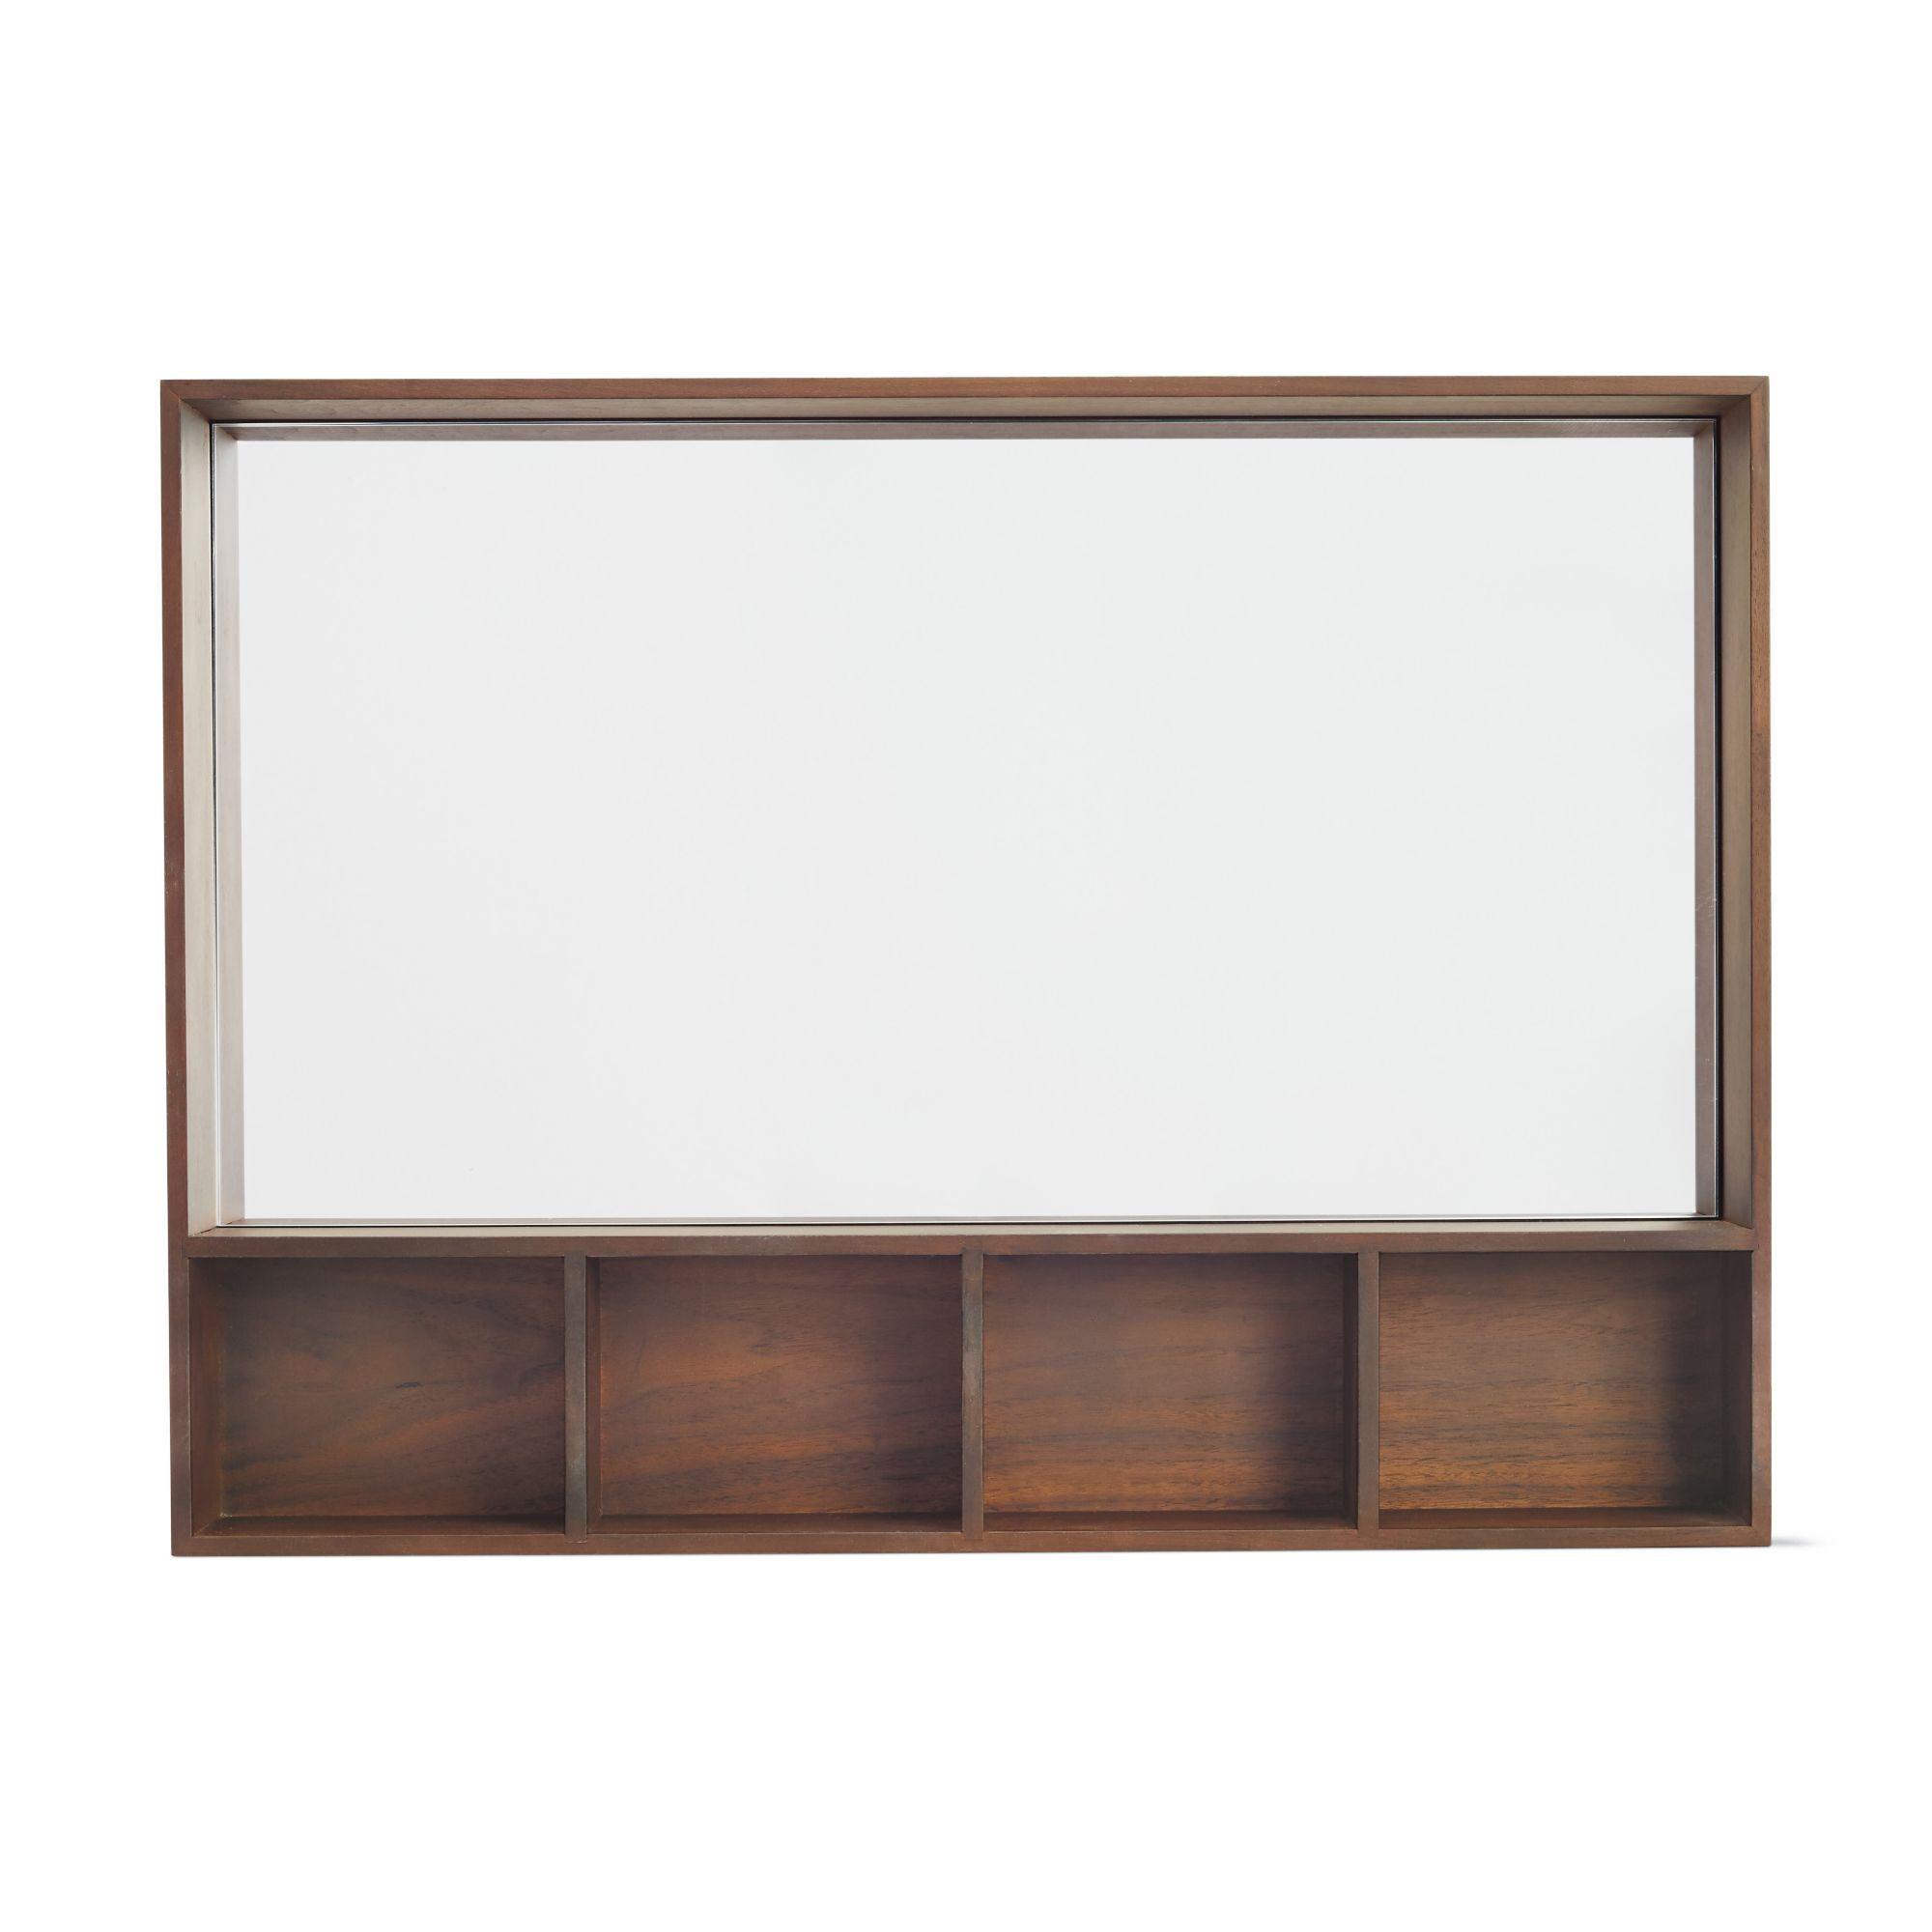 Arca Wall Board